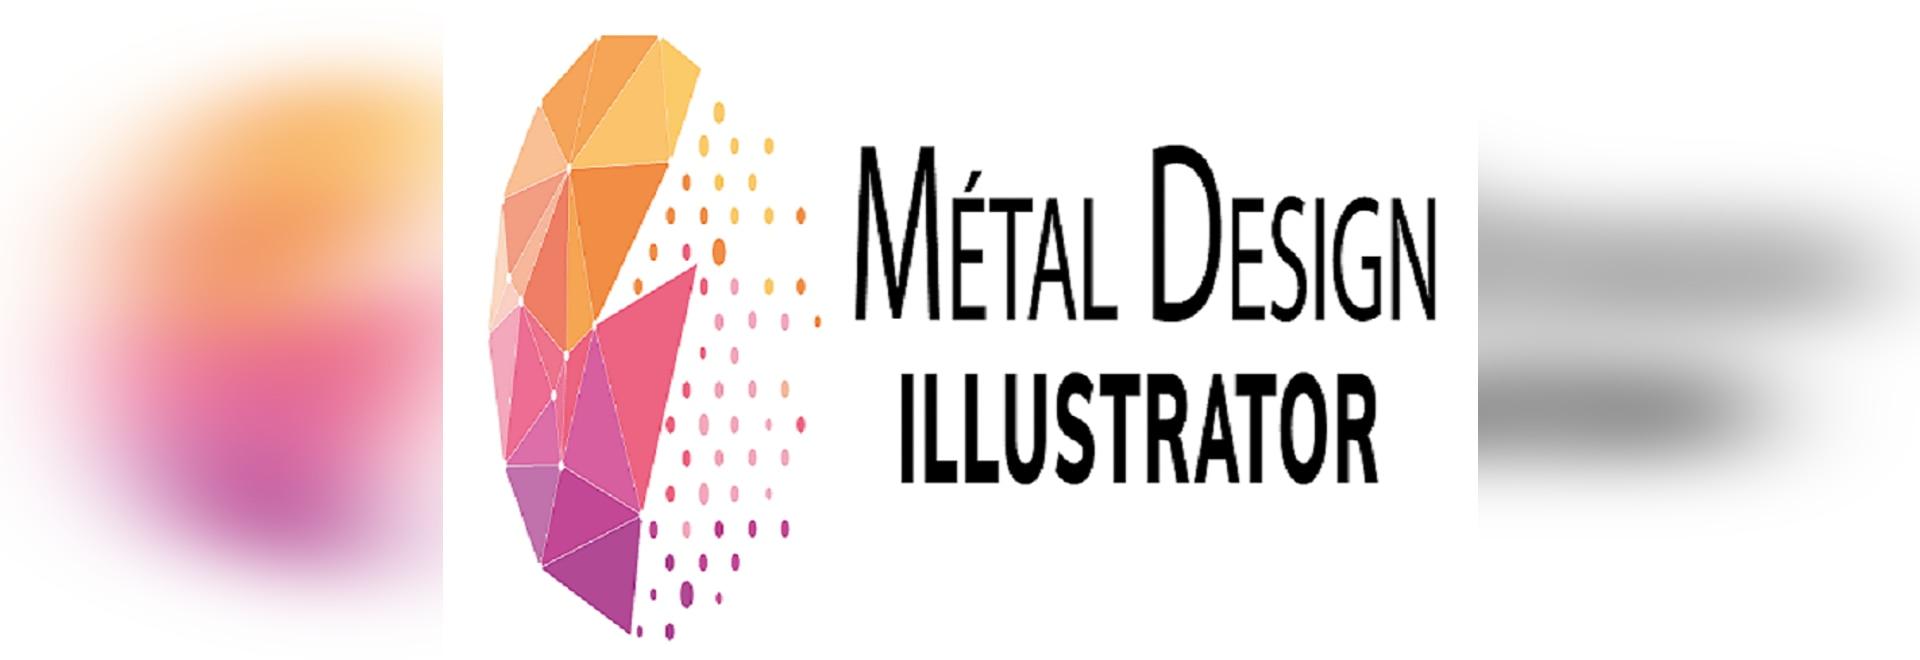 METAL DESIGN illustrator